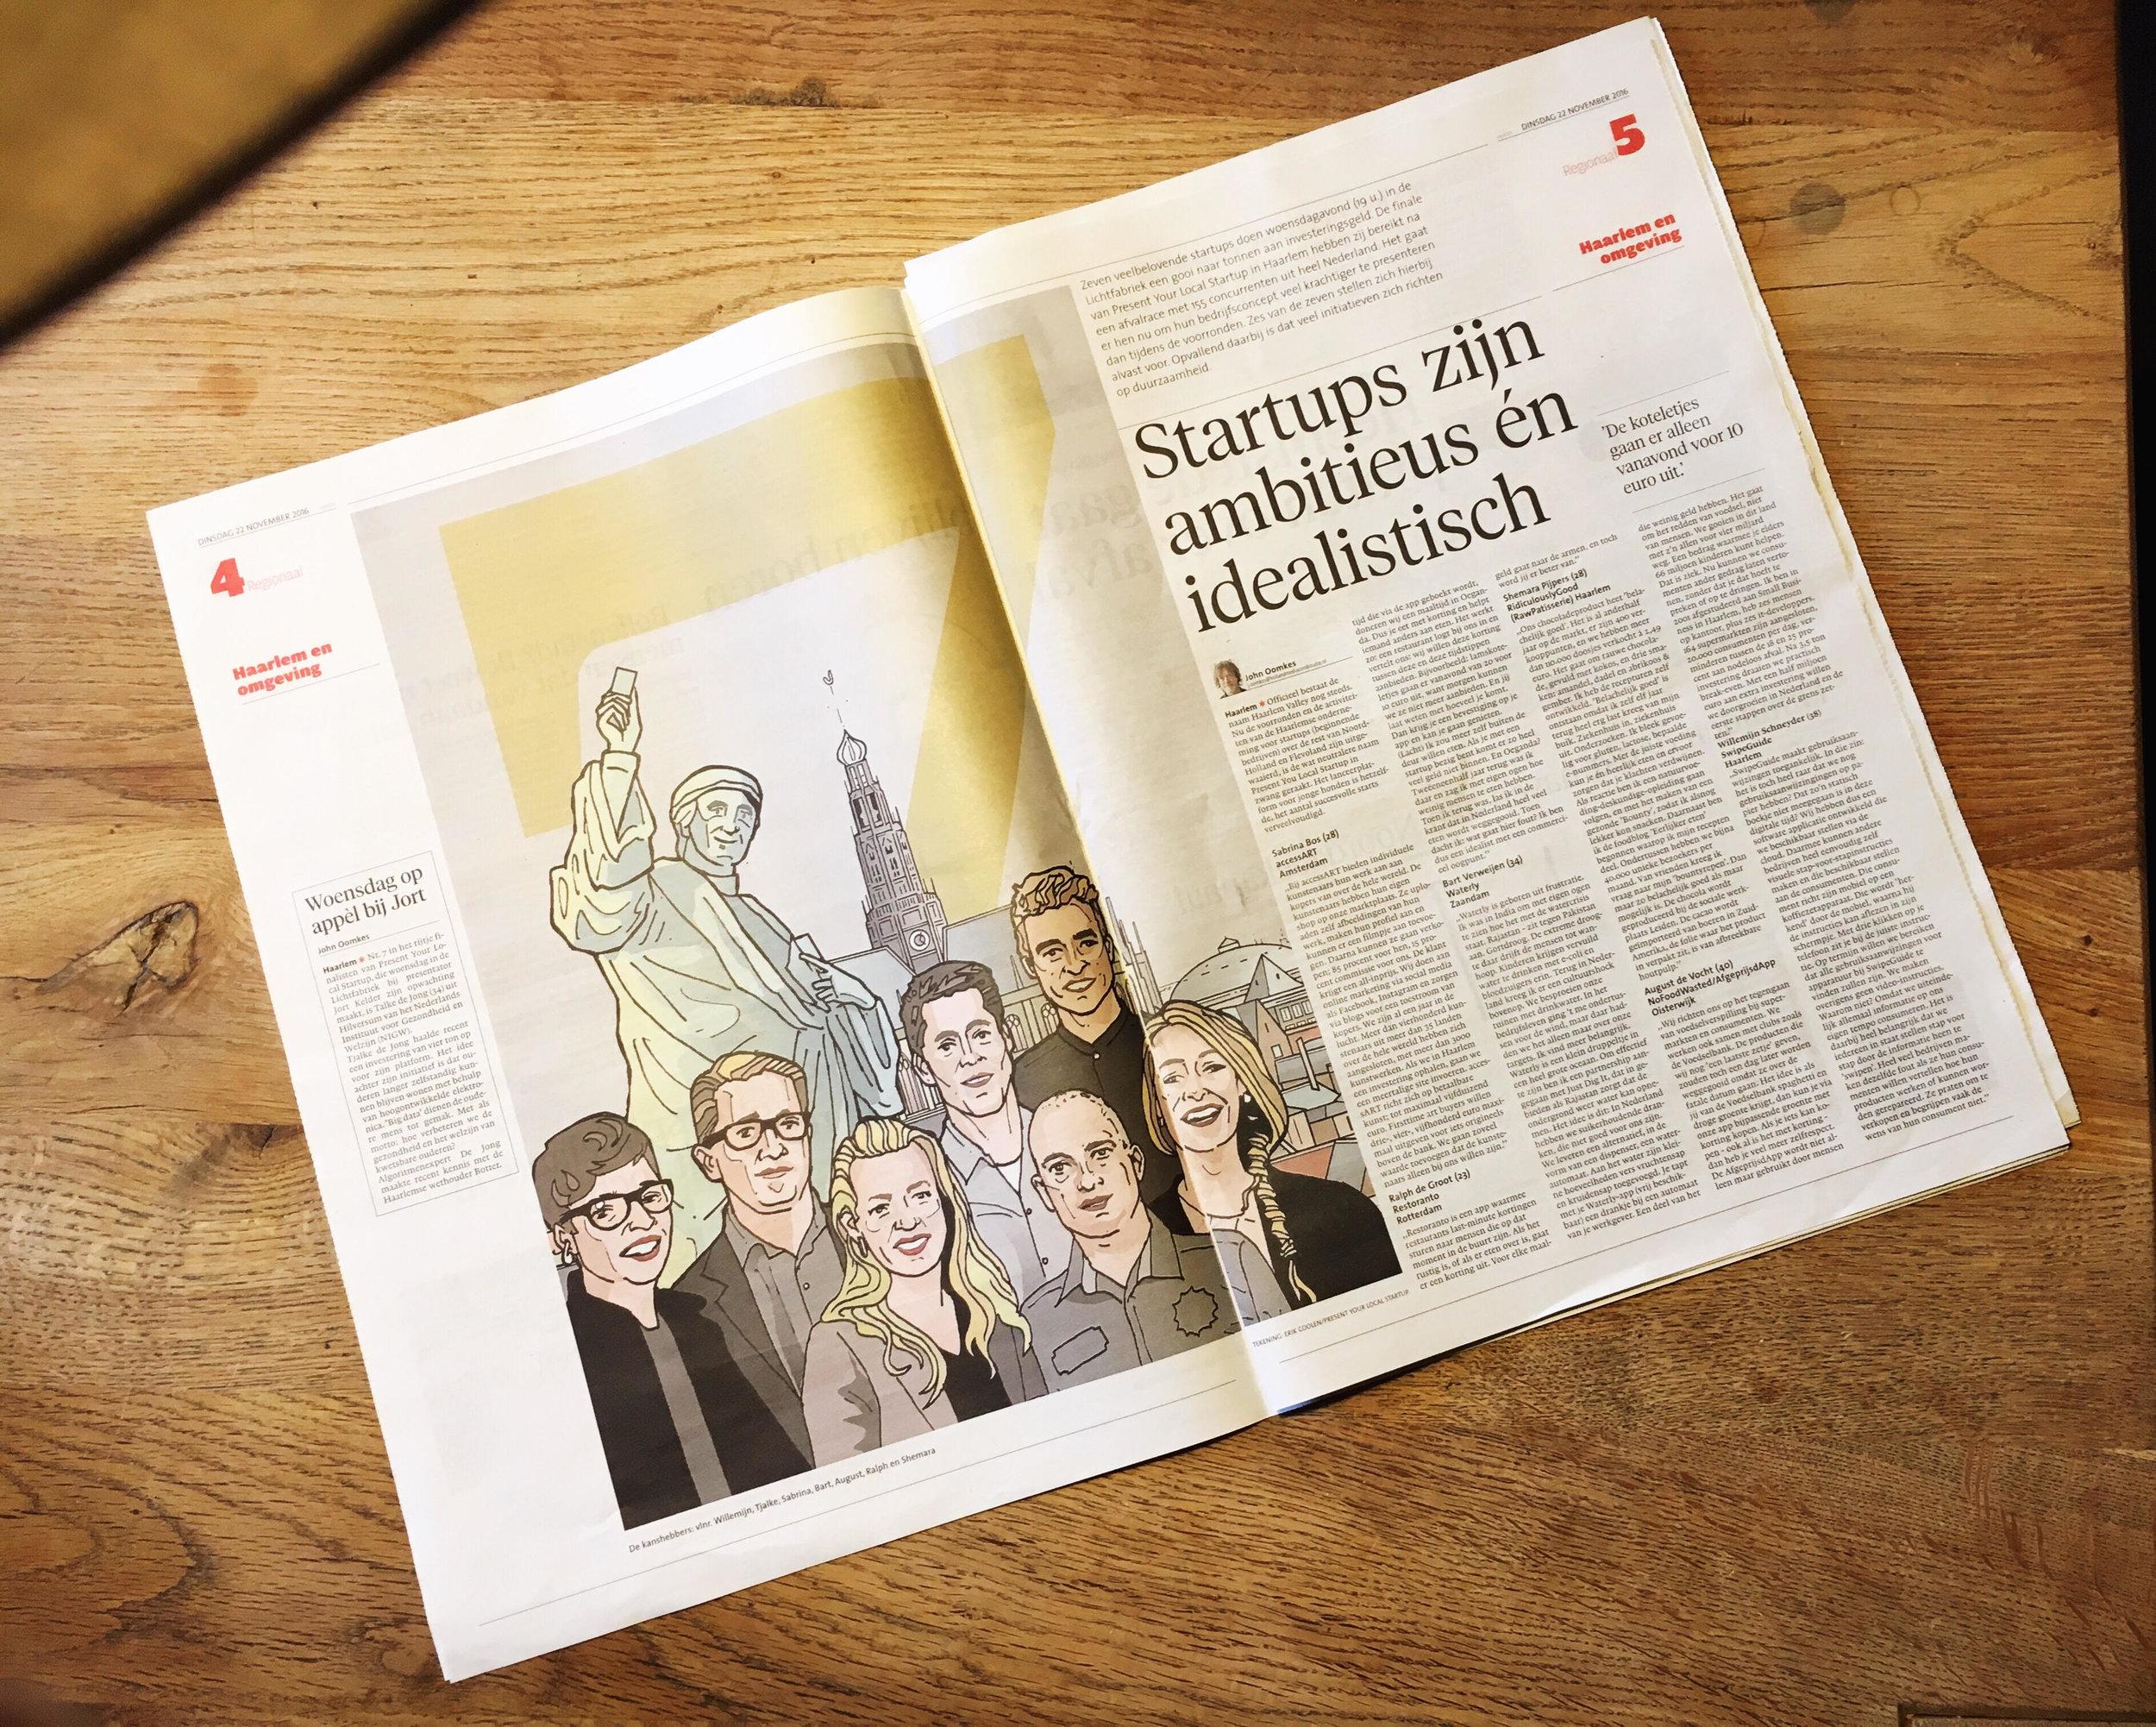 Haarlems Dagblad 22/11/16